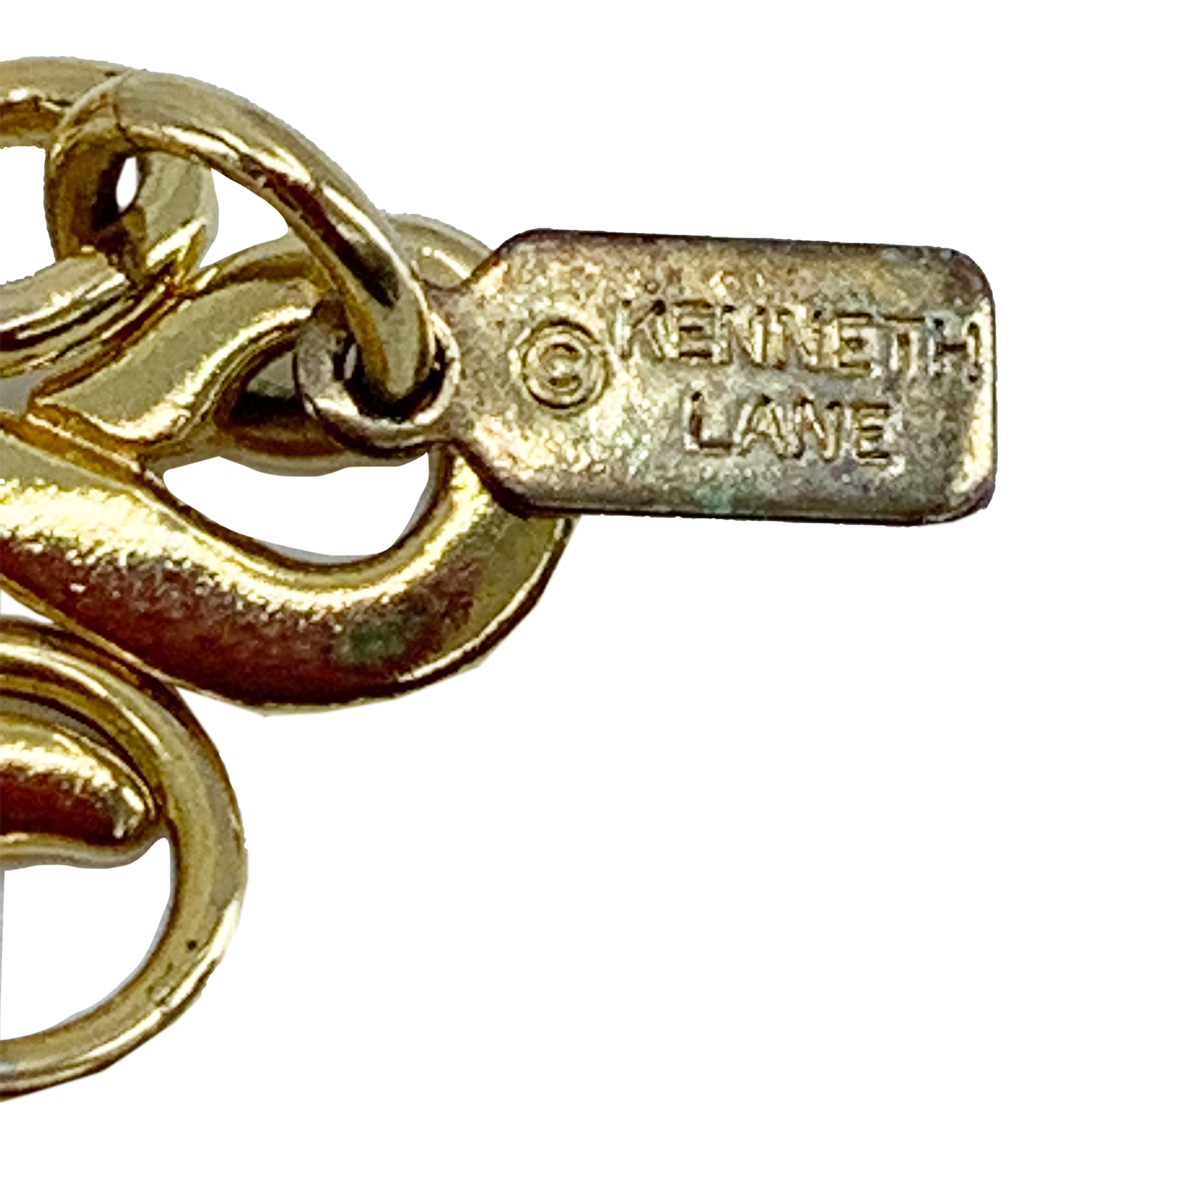 kenneth lane jewelry mark